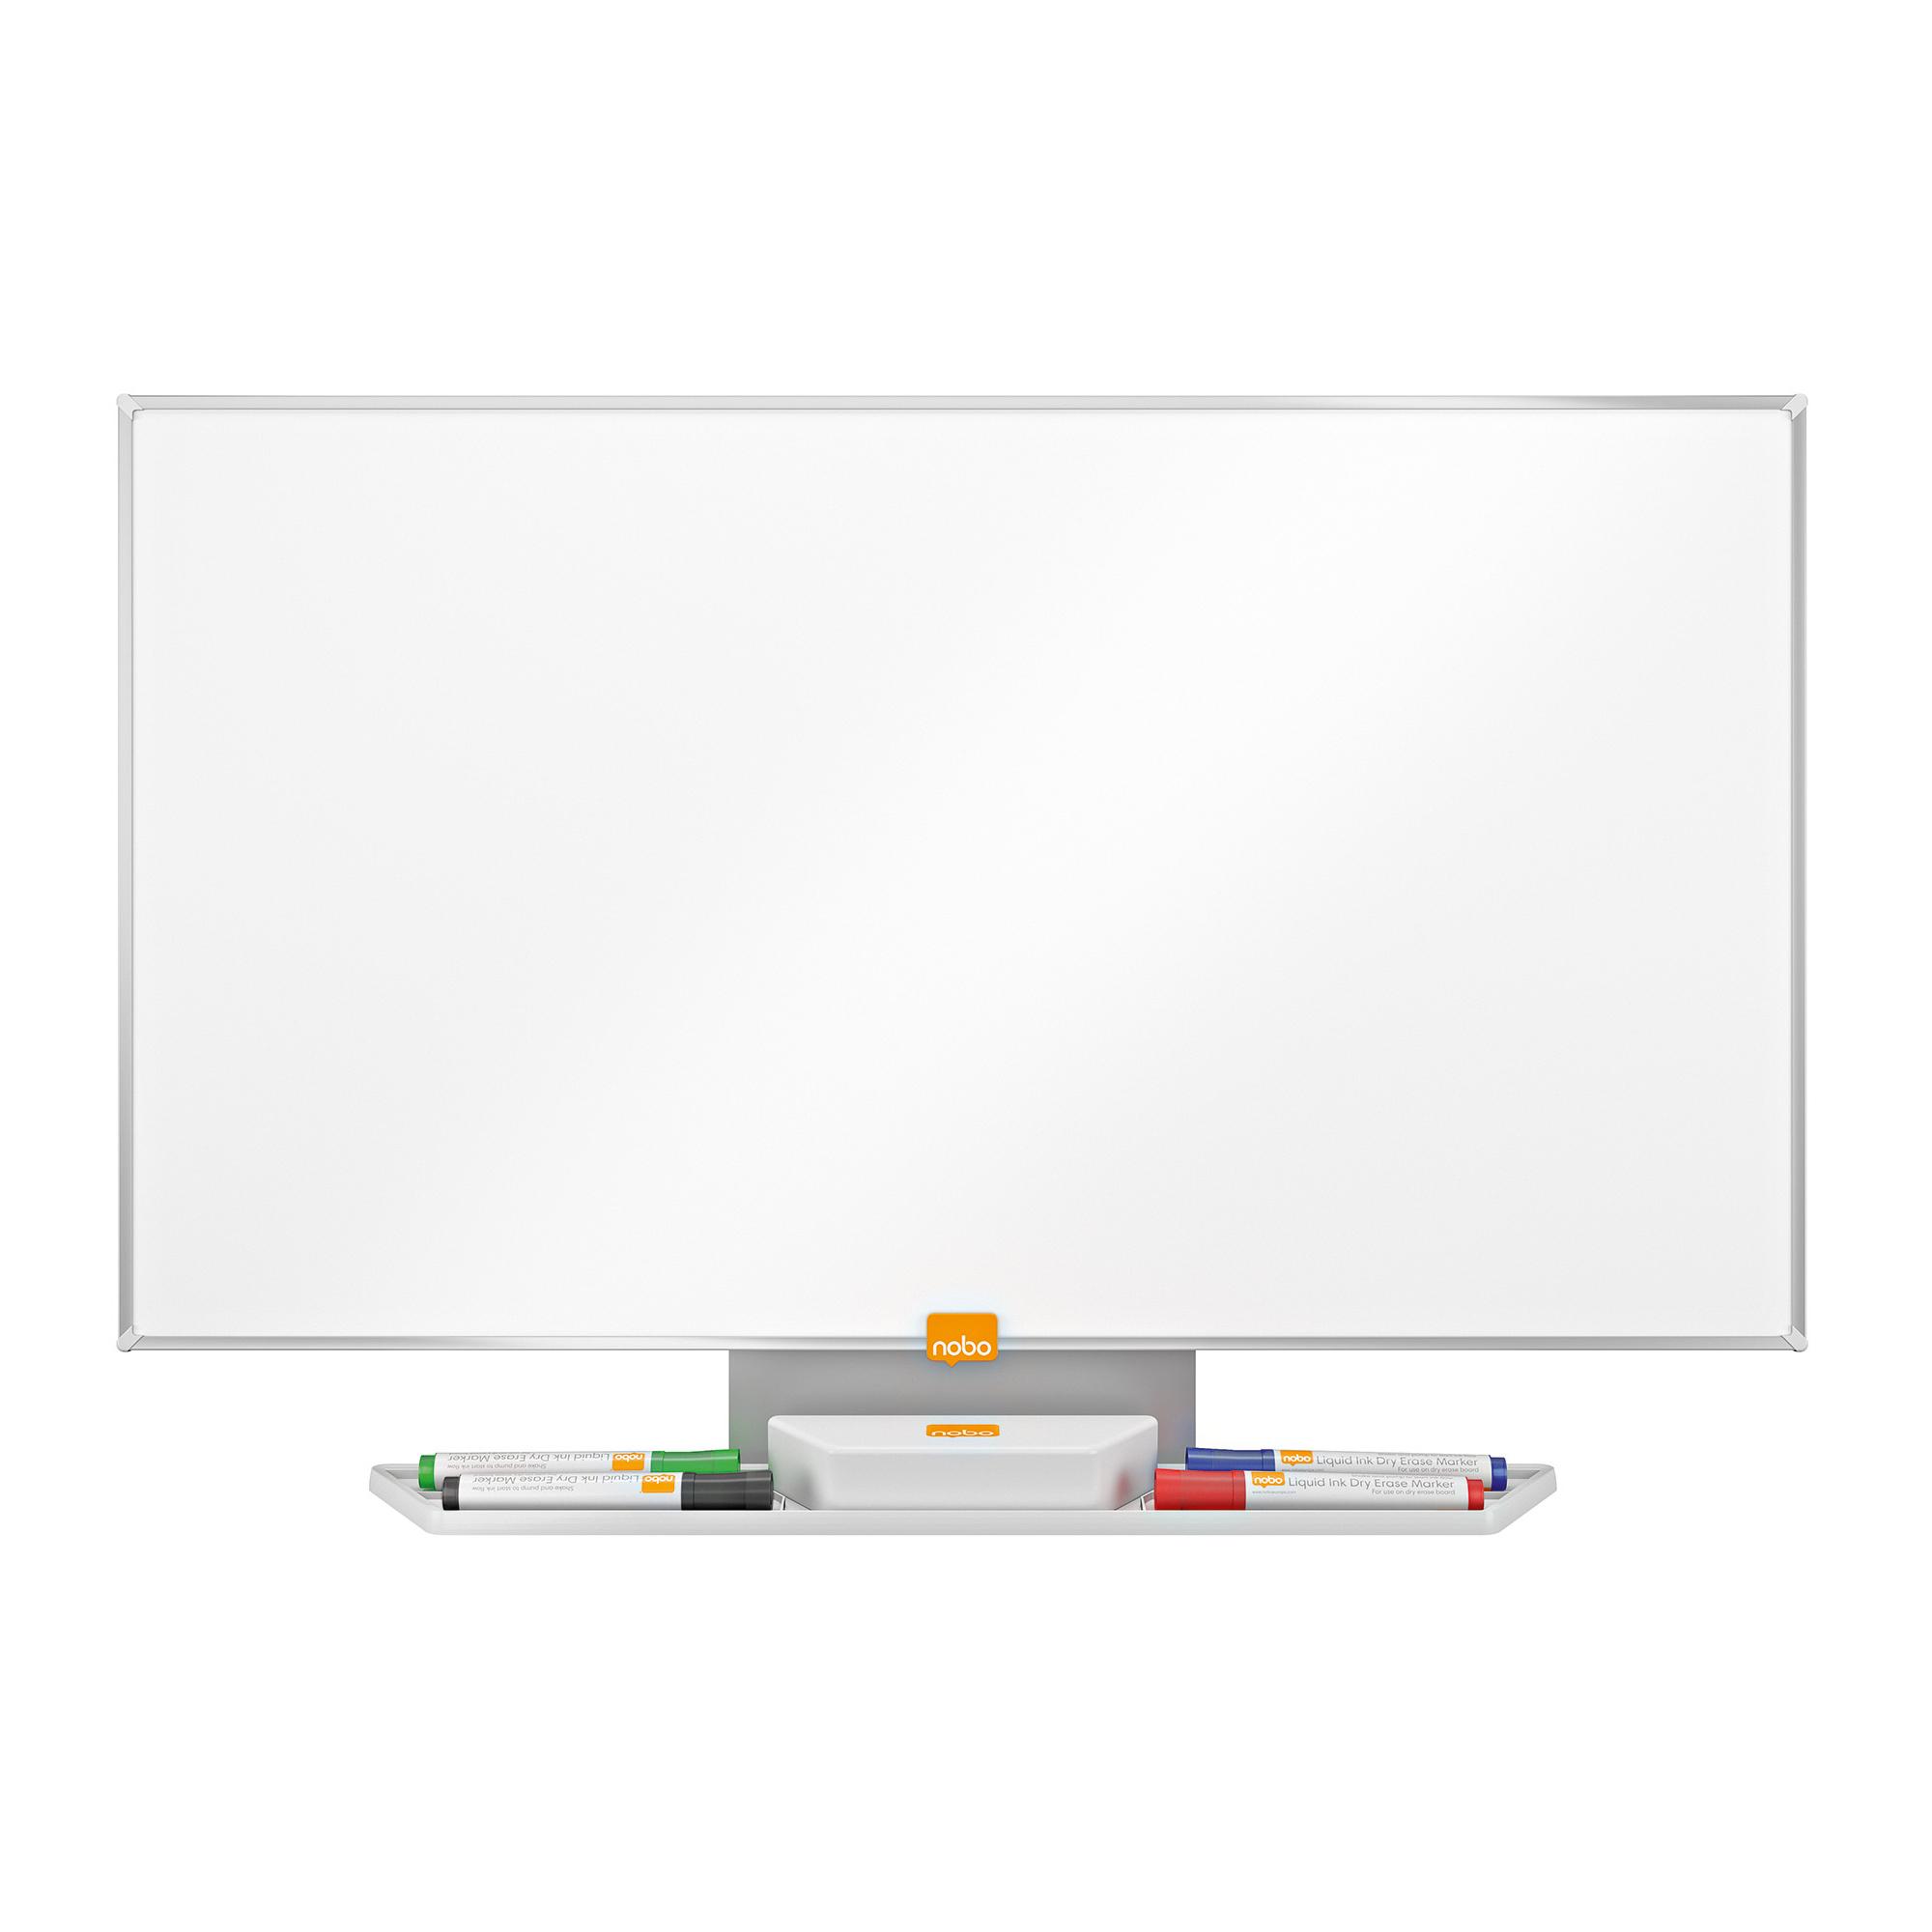 Nobo Whiteboard Widescreen 32in Nano Clean Magnetic W721xH411 Ref 1905296 [COMPETITION] Apr-Jun 19